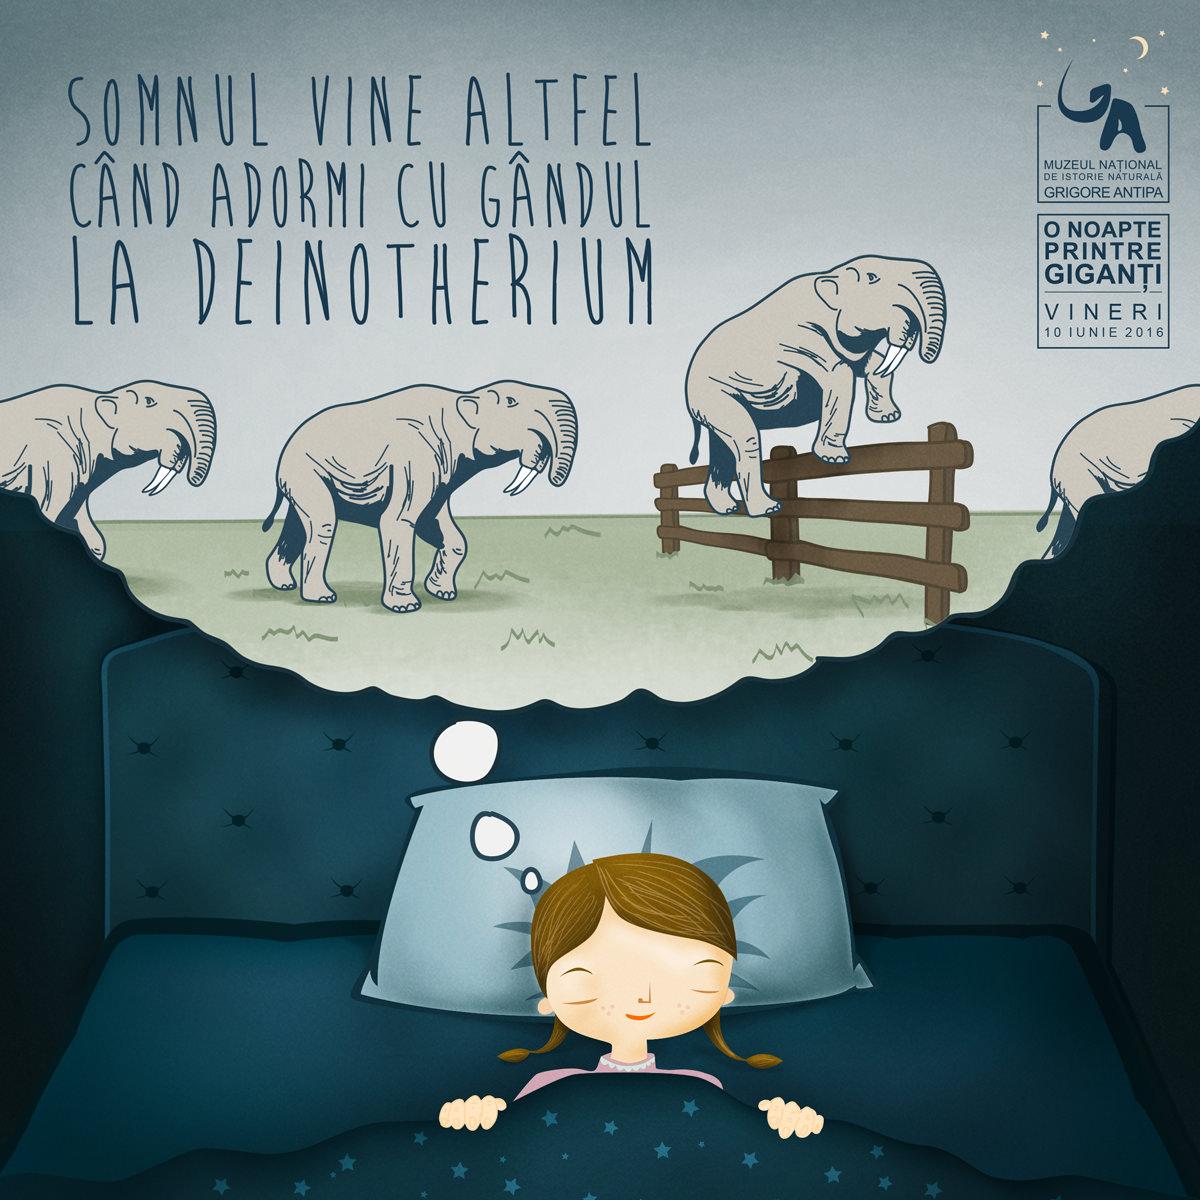 Copiii pot petrece o noapte la muzeu printre exponate, vineri, 10 iunie